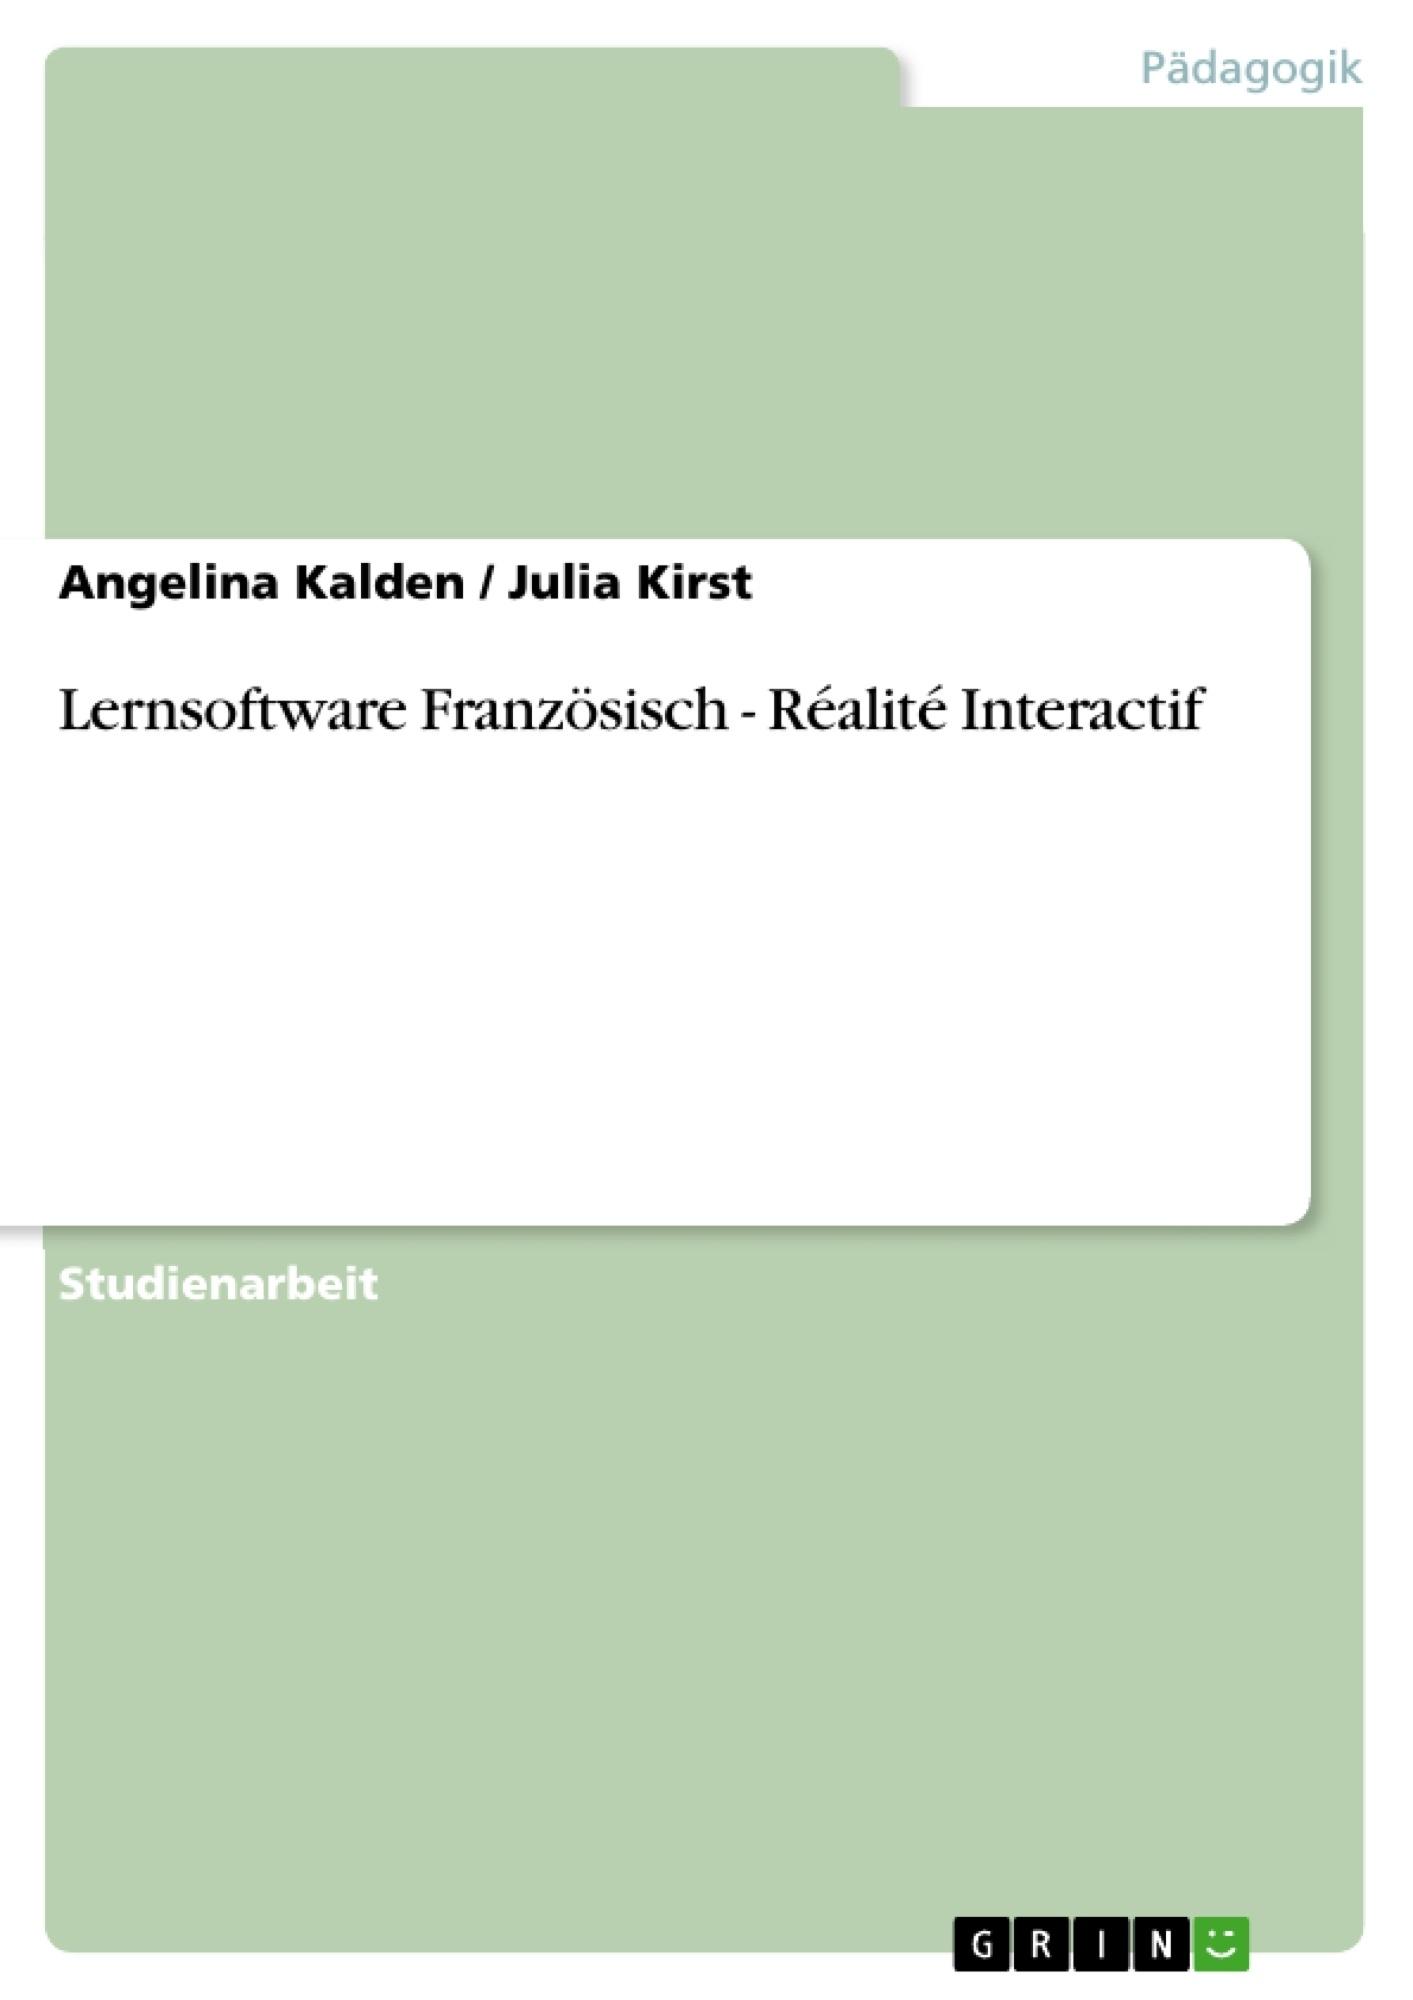 Titel: Lernsoftware Französisch - Réalité Interactif